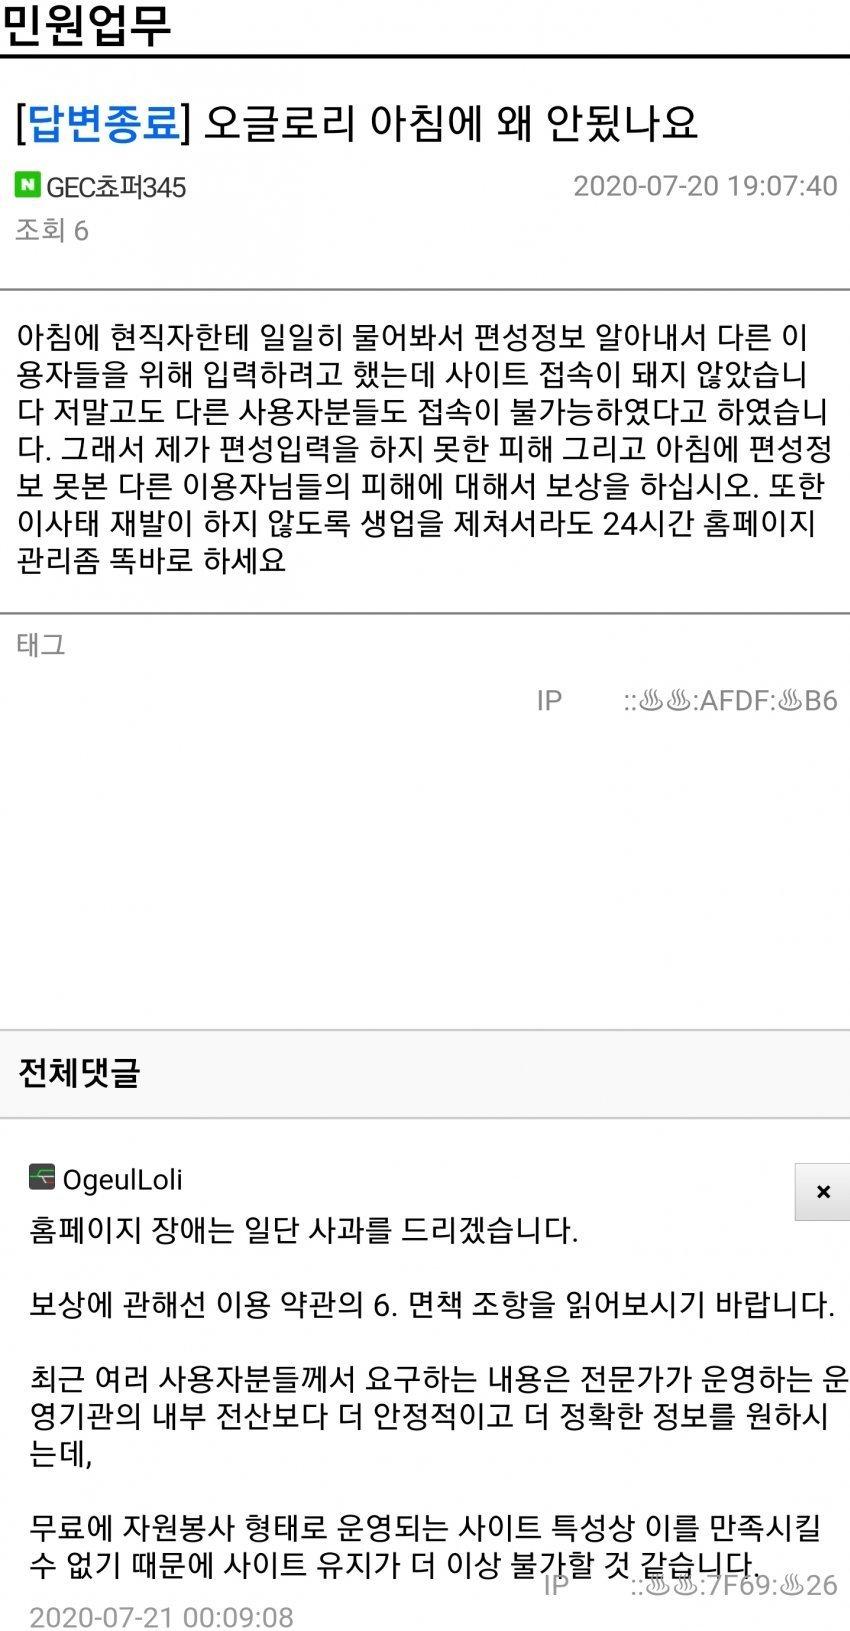 viewimage.php?id=20b2de29f7d331aa&no=24b0d769e1d32ca73dec87fa11d0283123a3619b5f9530e1a1306968e3deca13c514b1240bc8fe443f933e1db6a0b24a24eea330293cba4ced7c4fe7b5b5ebcdae4de165d3522dae17526004a3a11b87d5cdb9